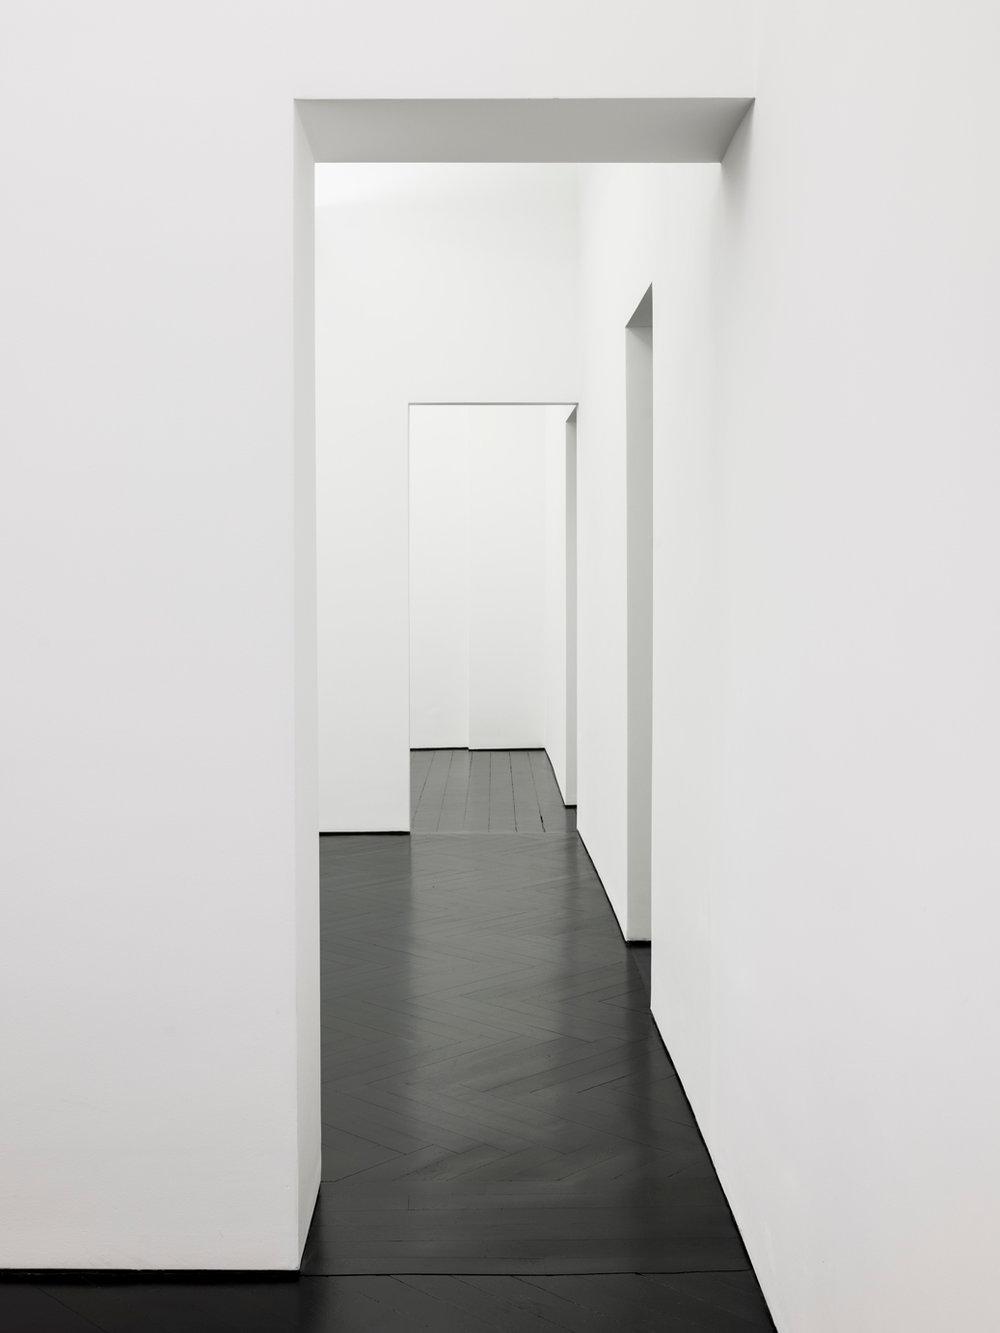 Galerie Berinson designed by Gonzalez Haase AAS